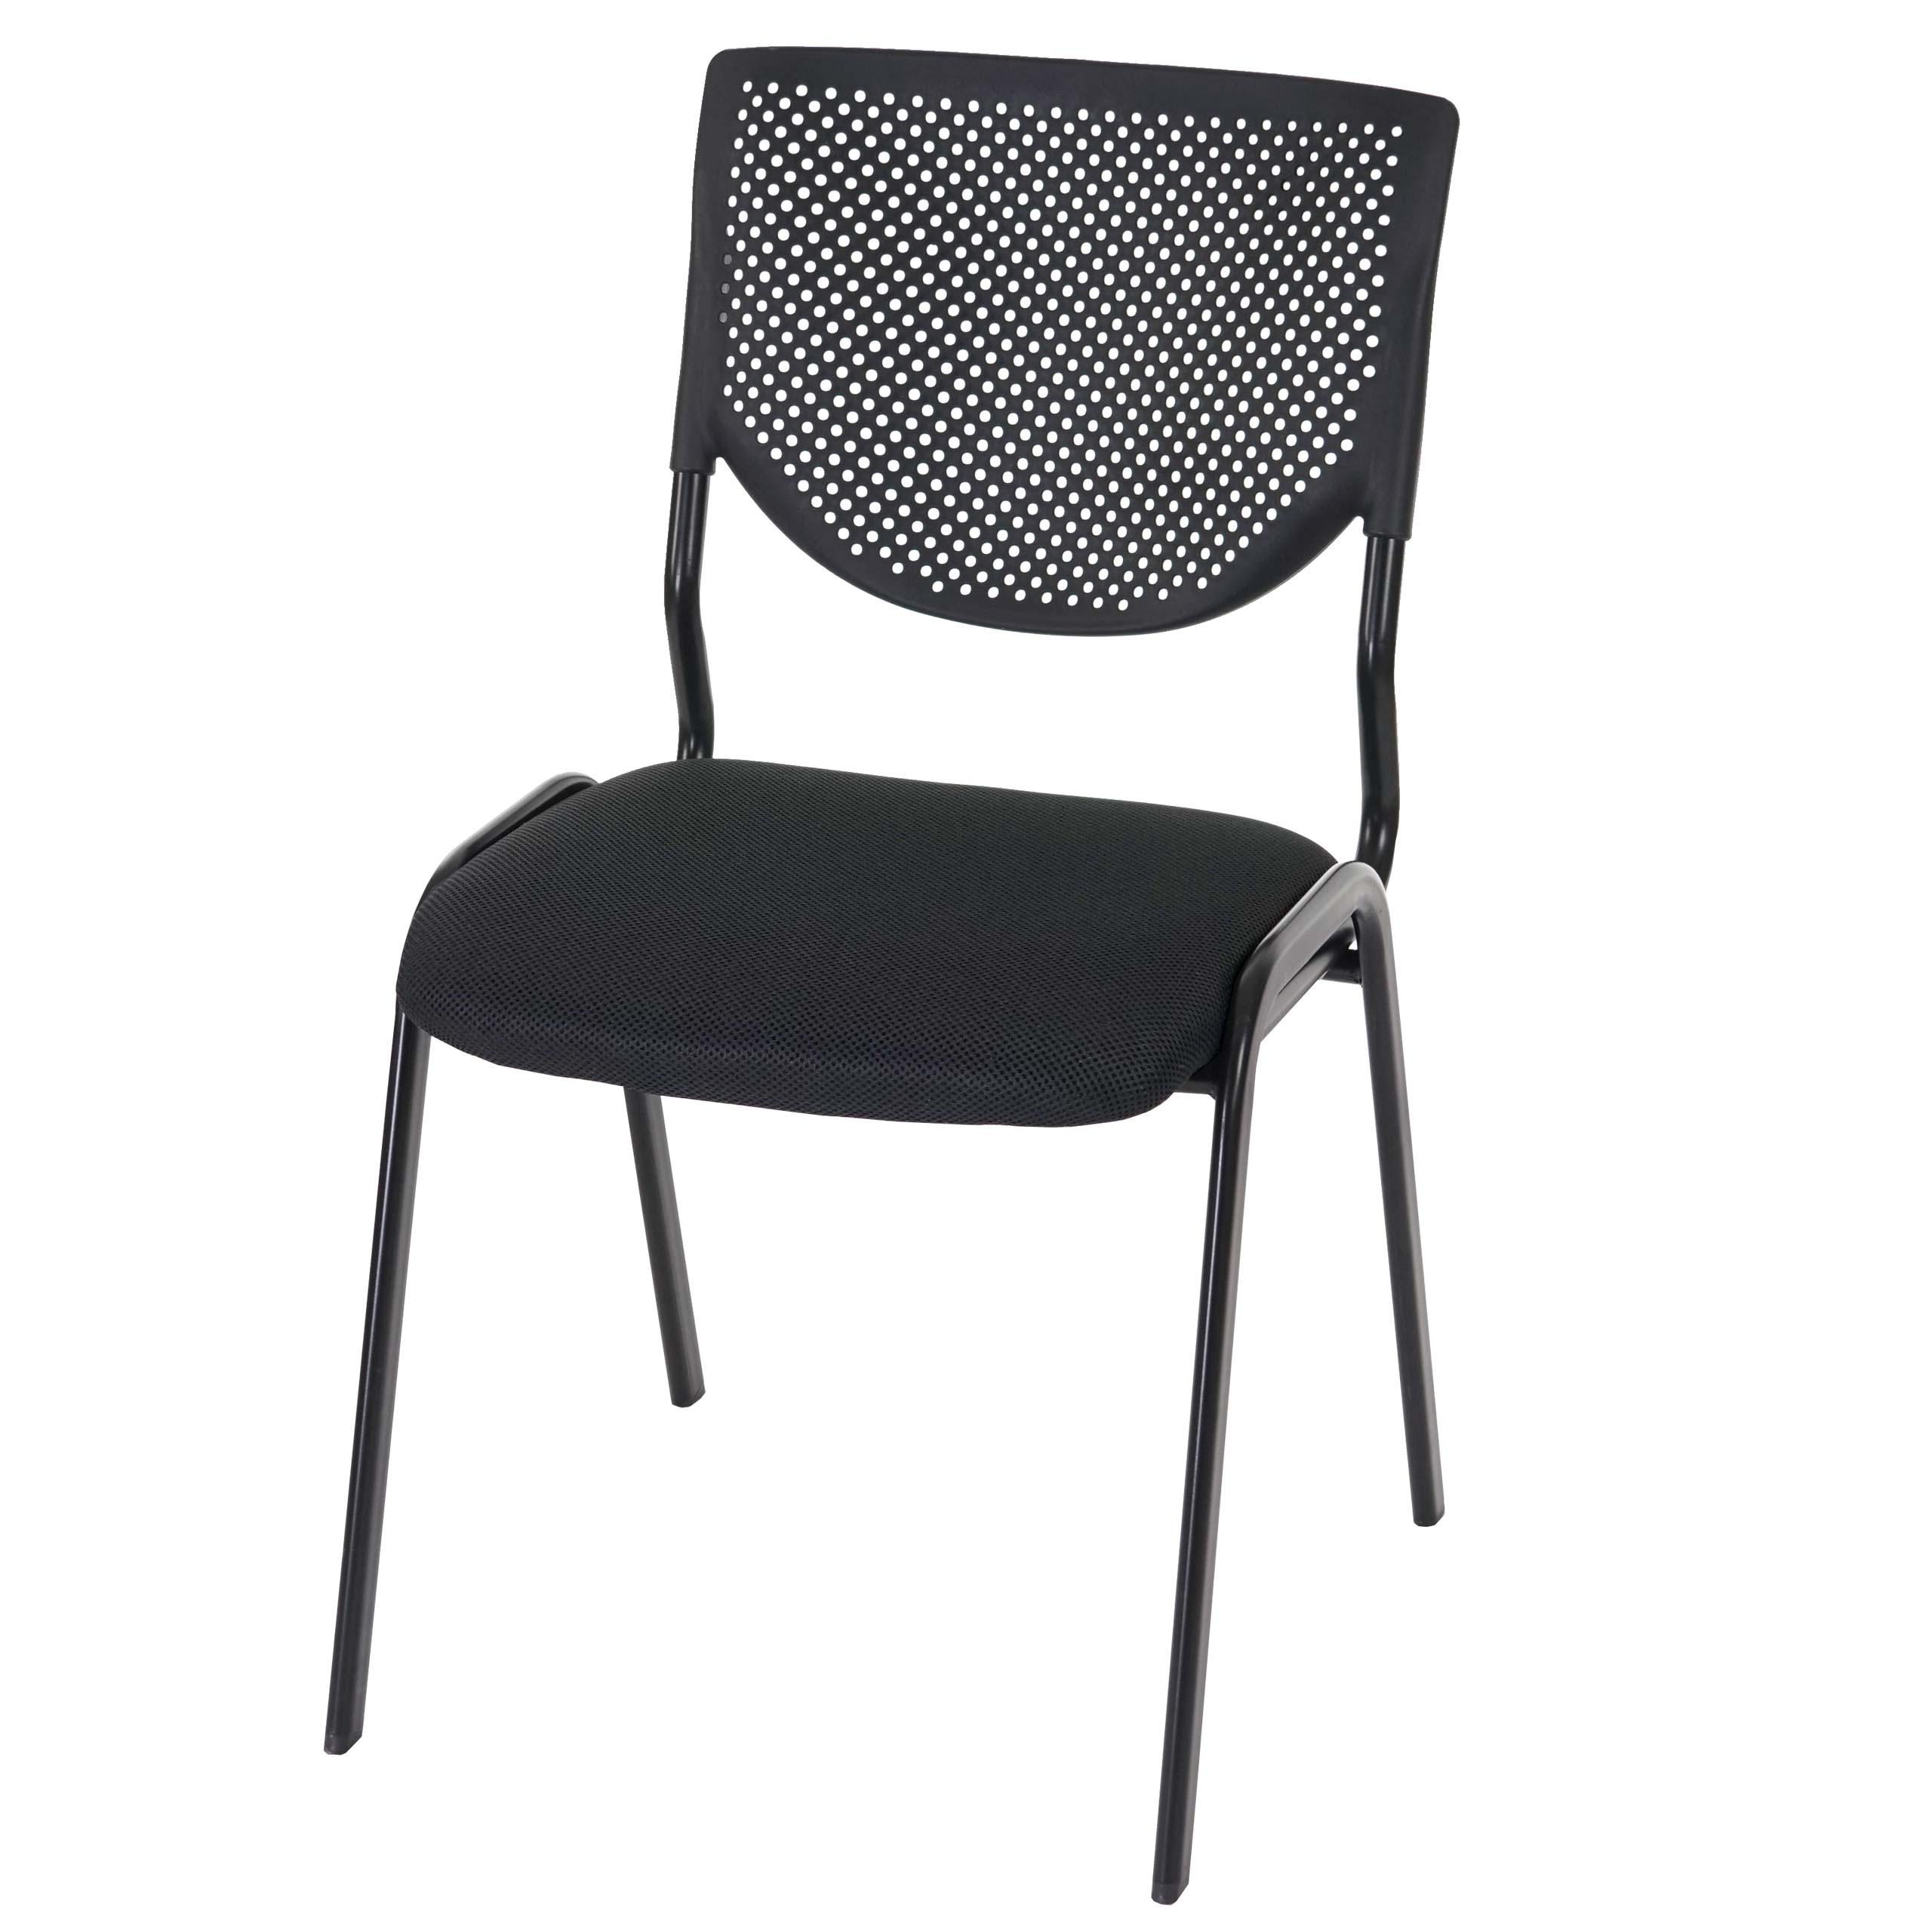 2x besucherstuhl t401 konferenzstuhl kaufen bei mendler vertriebs gmbh. Black Bedroom Furniture Sets. Home Design Ideas